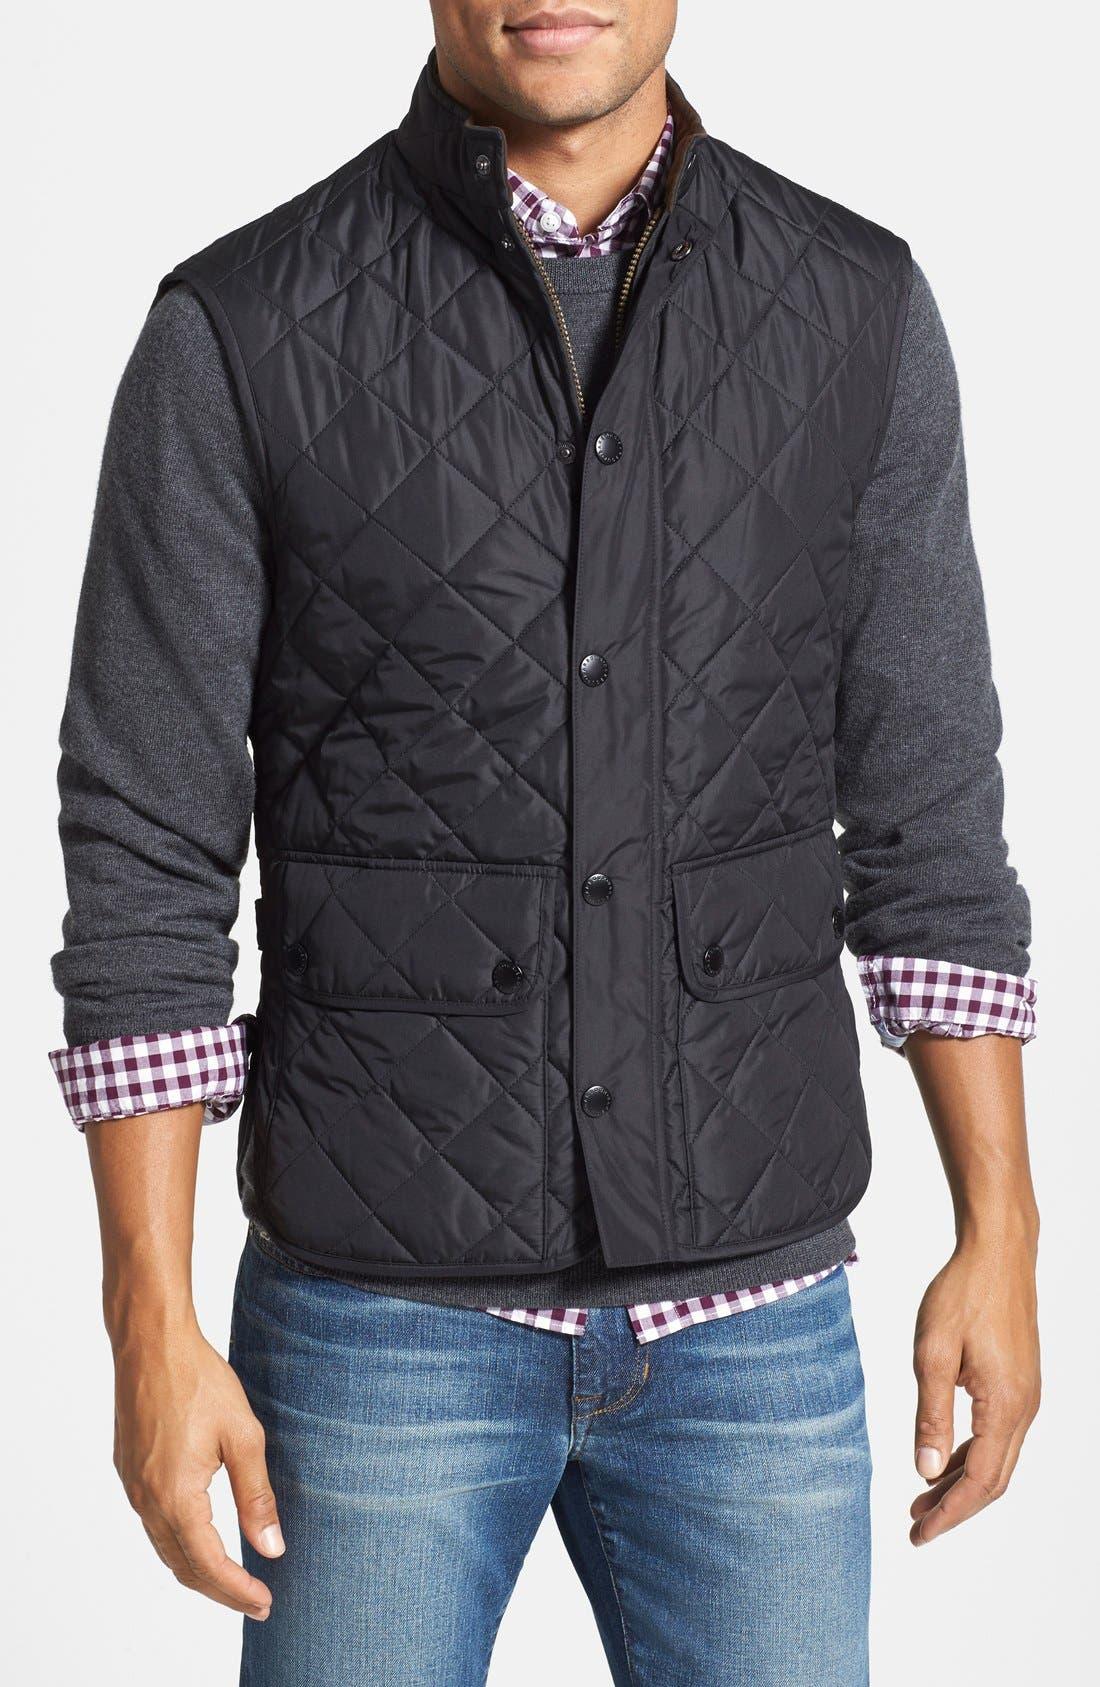 Men's Black Vest Coats & Men's Black Vest Jackets | Nordstrom